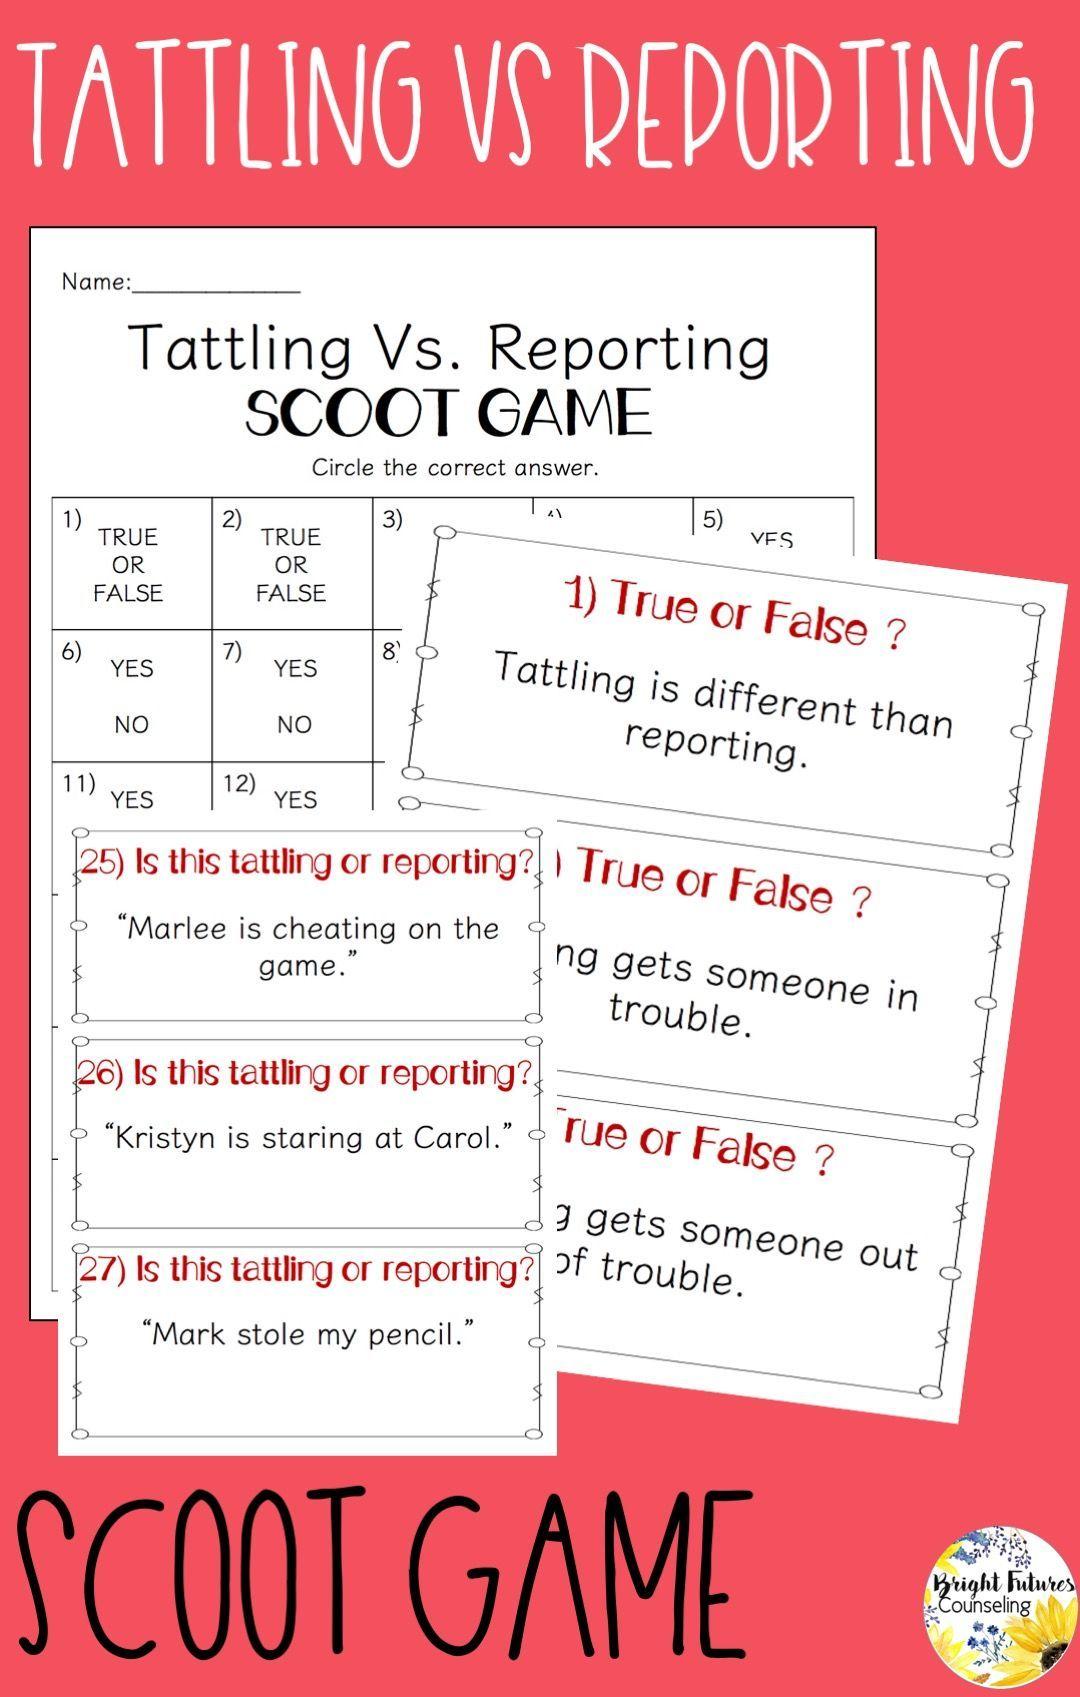 Tattling Vs Reporting Worksheet Printable Worksheets And Activities For Teachers Parents Tutors And Homeschool Families